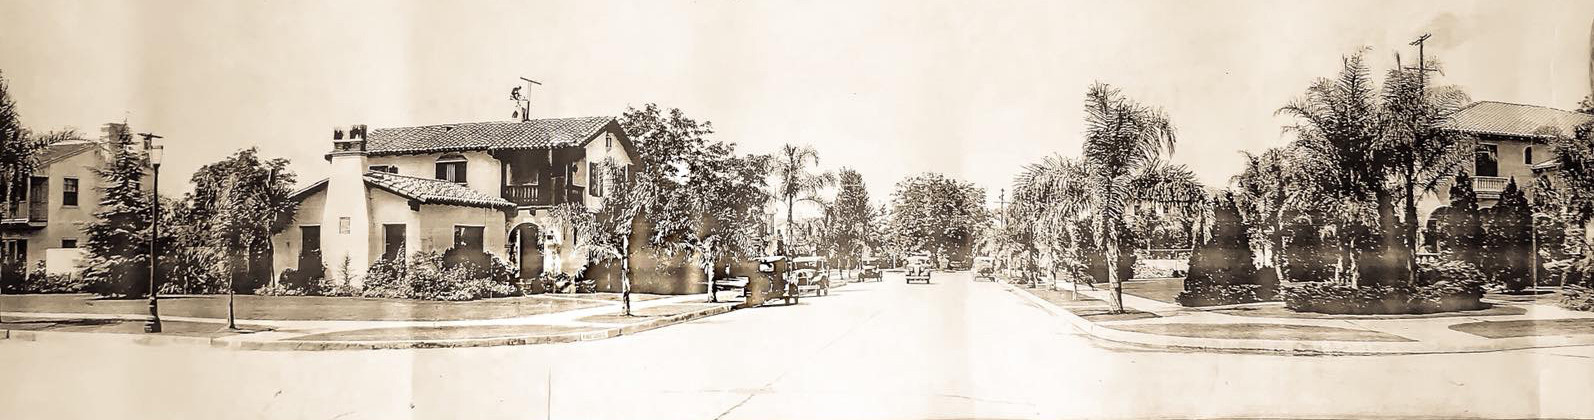 historic Floral Park Santa Ana